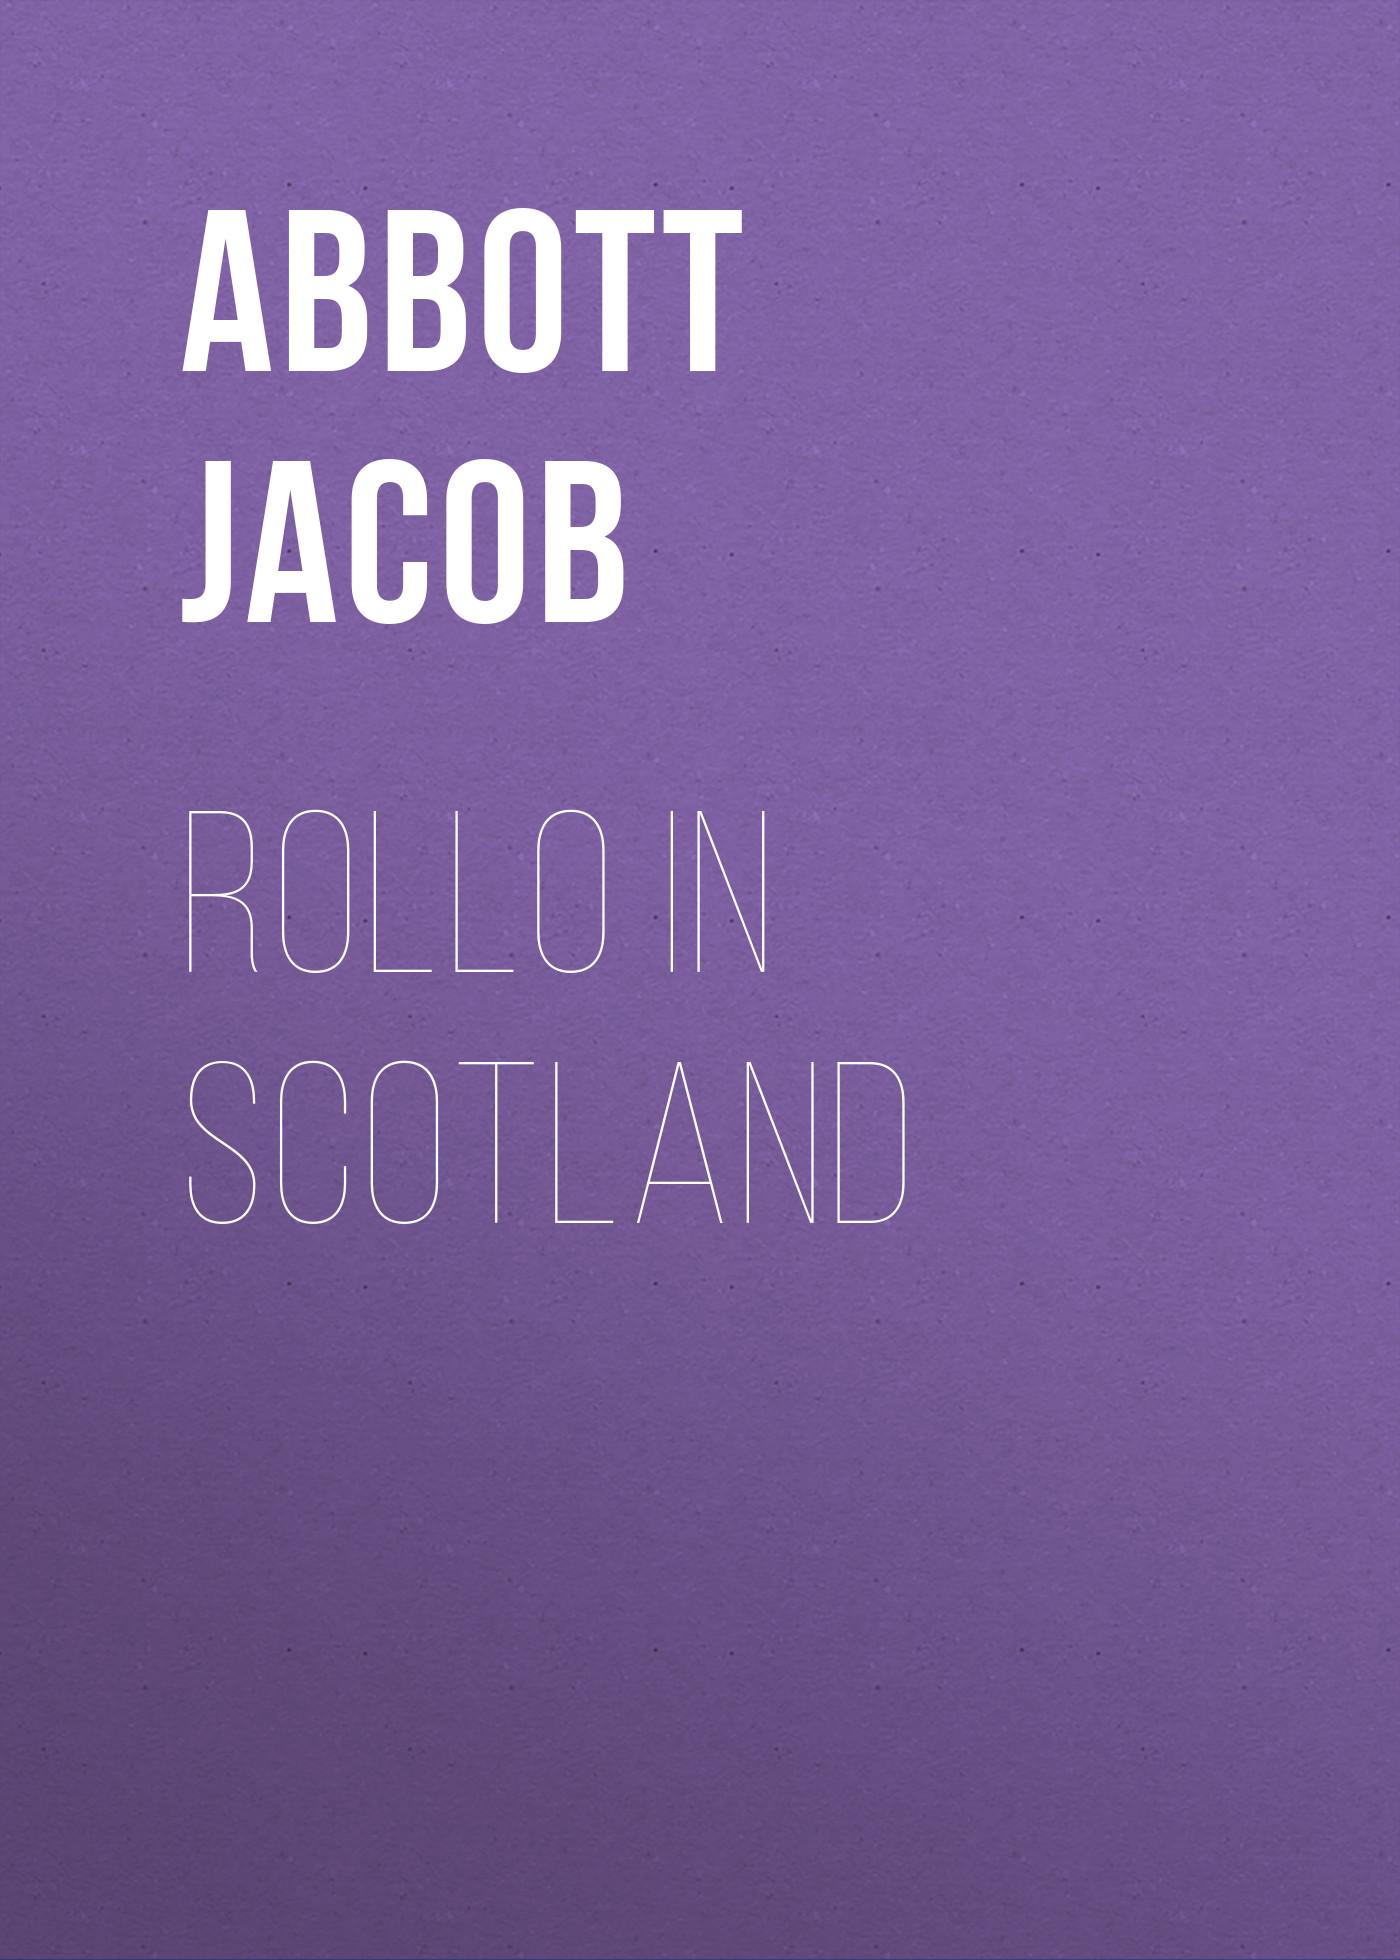 Abbott Jacob Rollo in Scotland abbott jacob rollo on the rhine